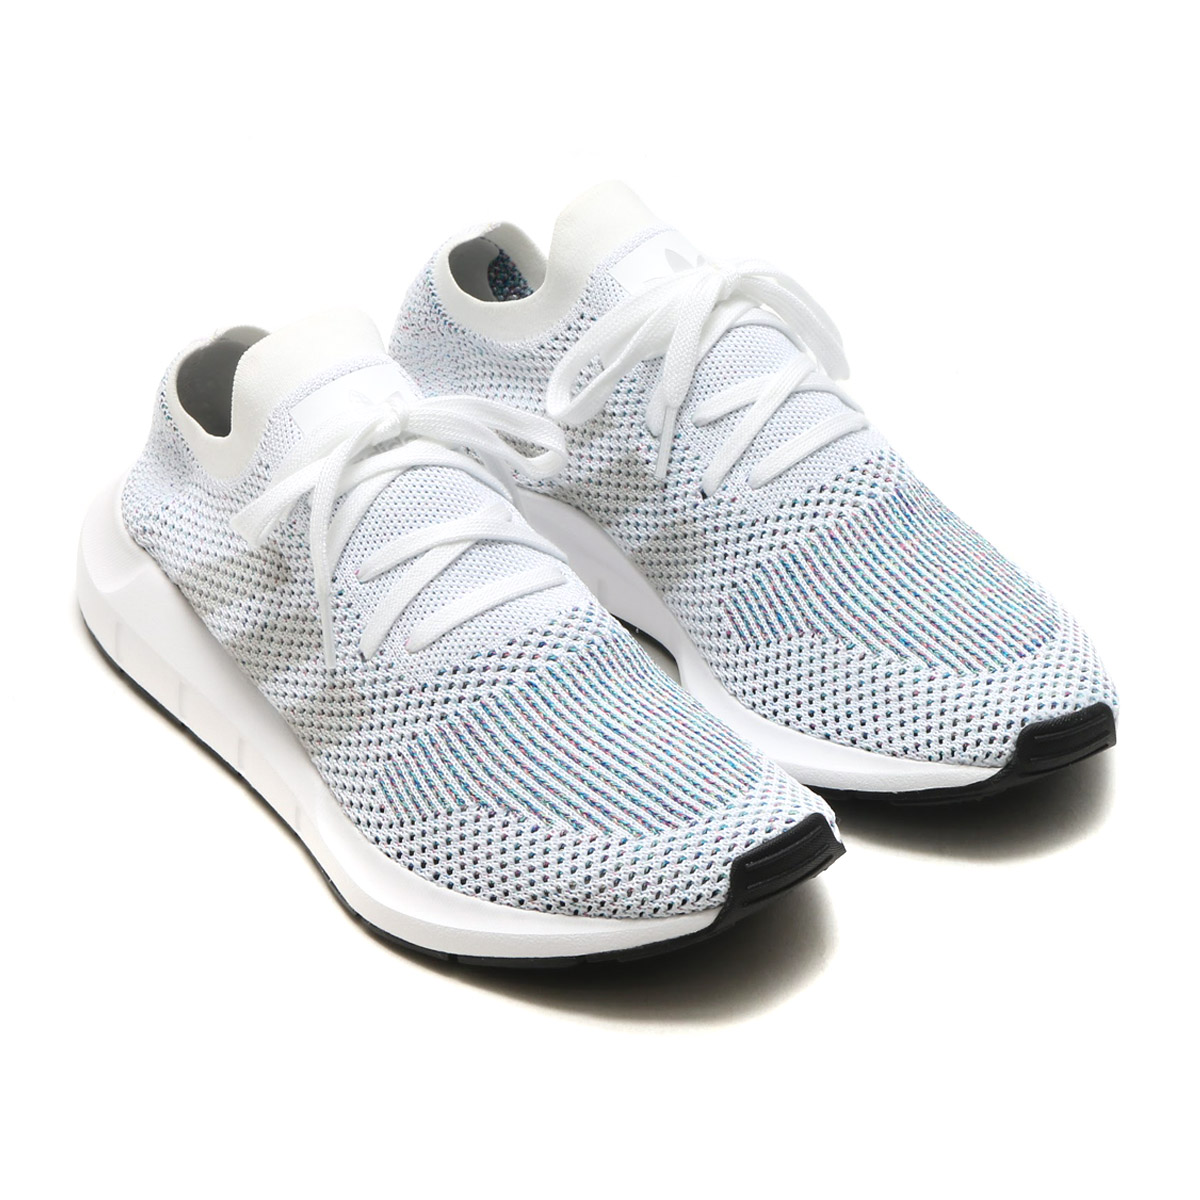 adidas Originals SWIFTRUN PK(アディダス オリジナルス スウィフトラン)(Running White/Grey One/Core Black) 【メンズサイズ】【17FW-I】